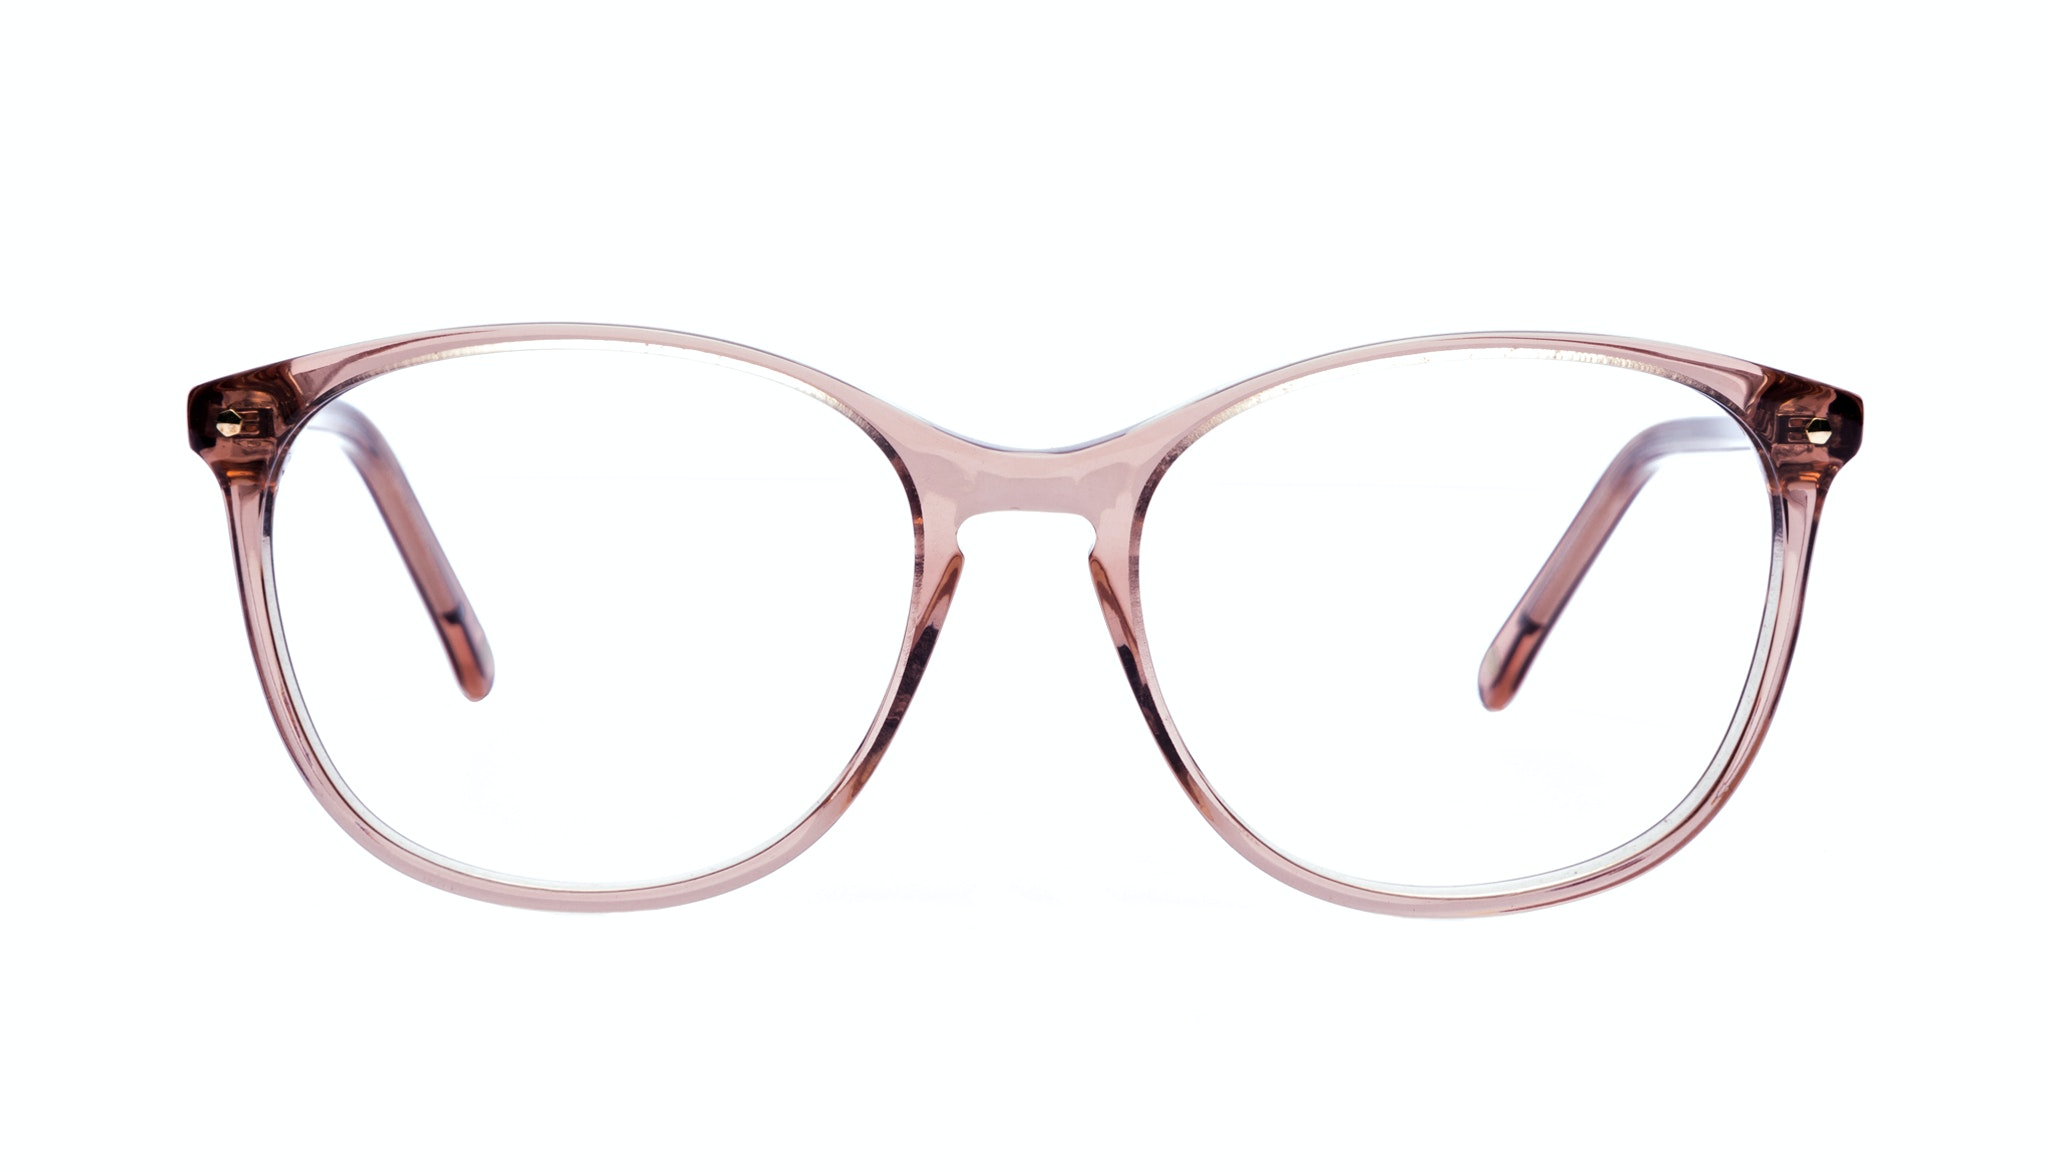 Affordable Fashion Glasses Rectangle Round Eyeglasses Women Nadine Rose Front